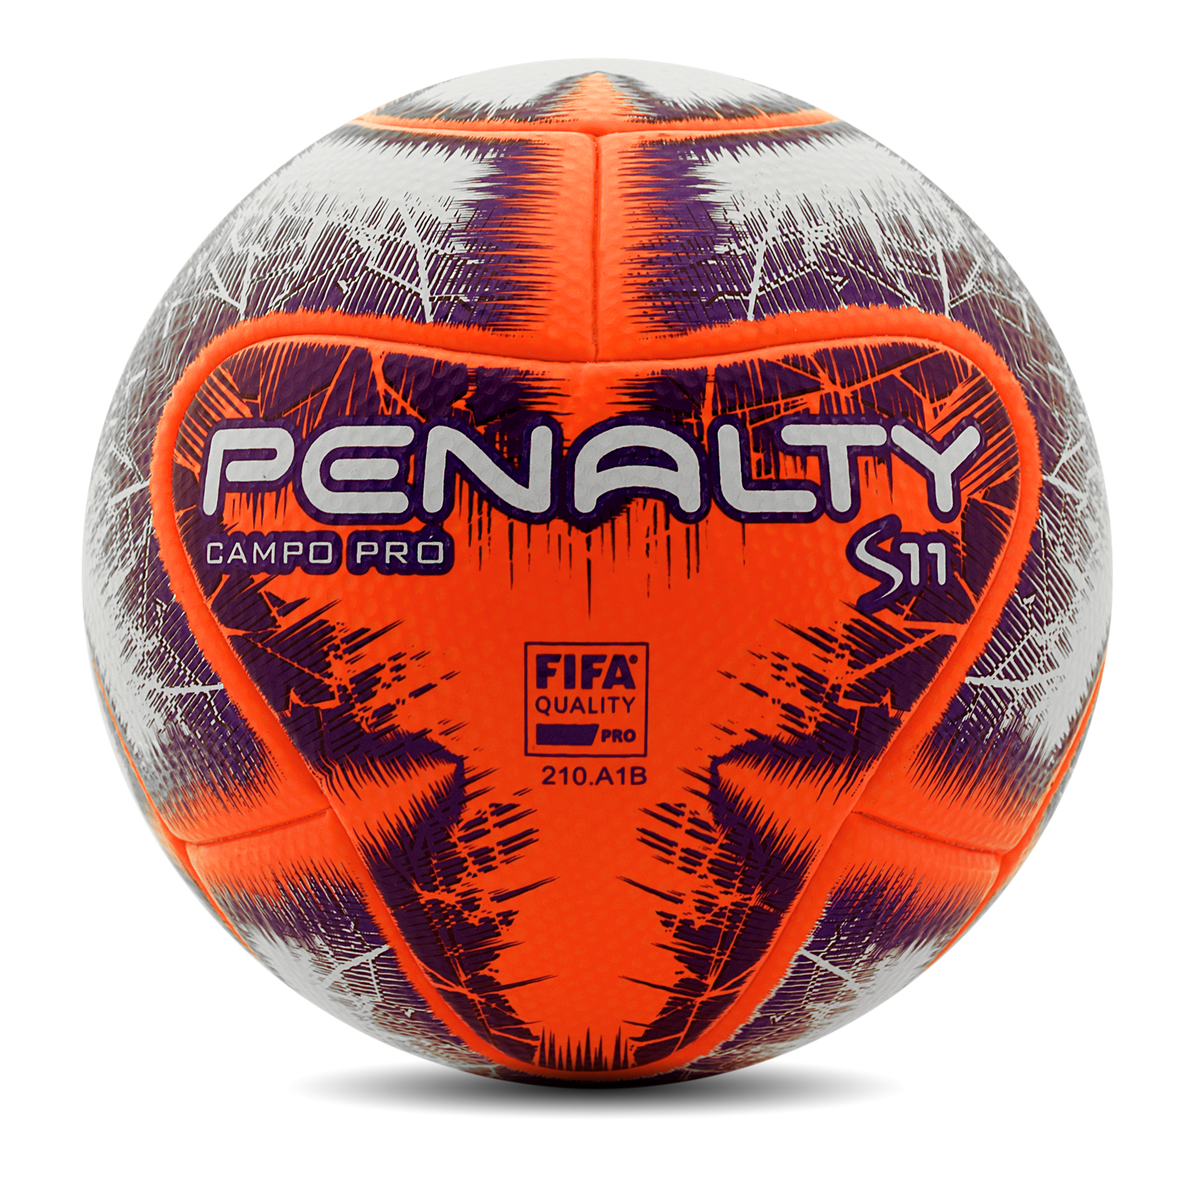 Conheça a bola que será utilizada no Campeonato Amazonense 2019 ... 5a0d5bbcf910f